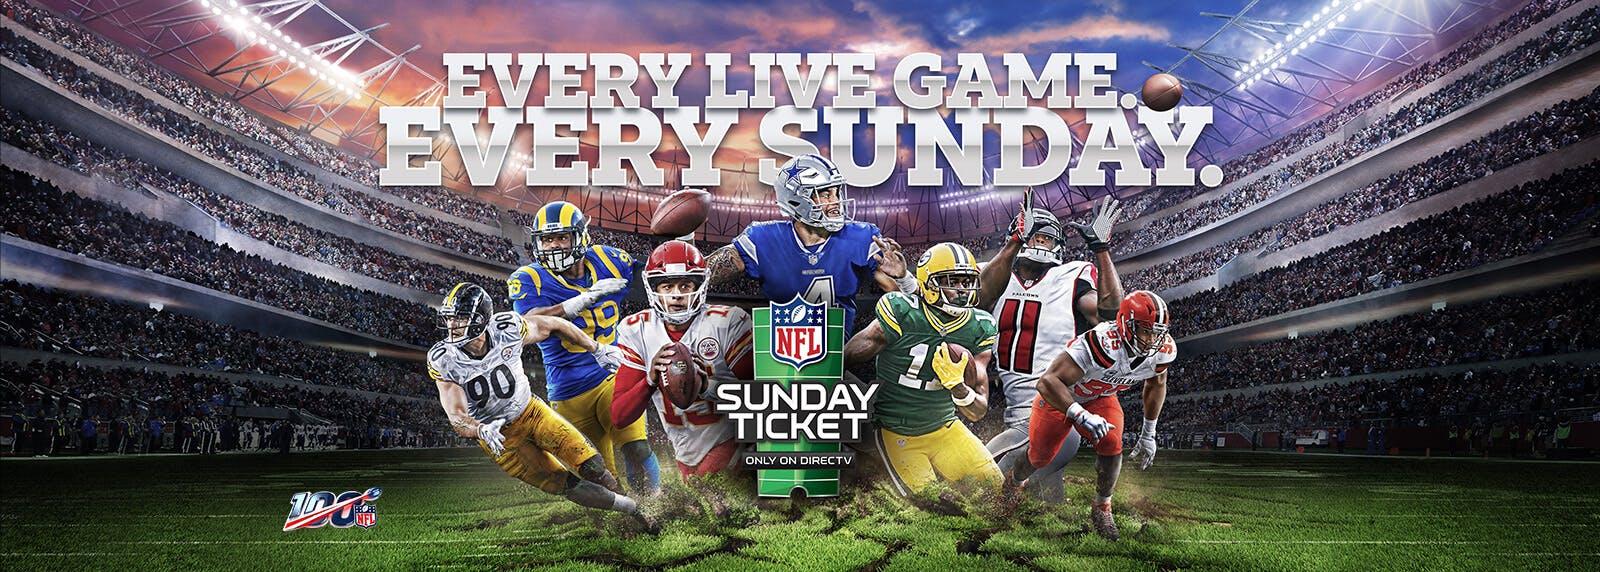 watch redskins vs 49ers livestream nfl sunday ticket